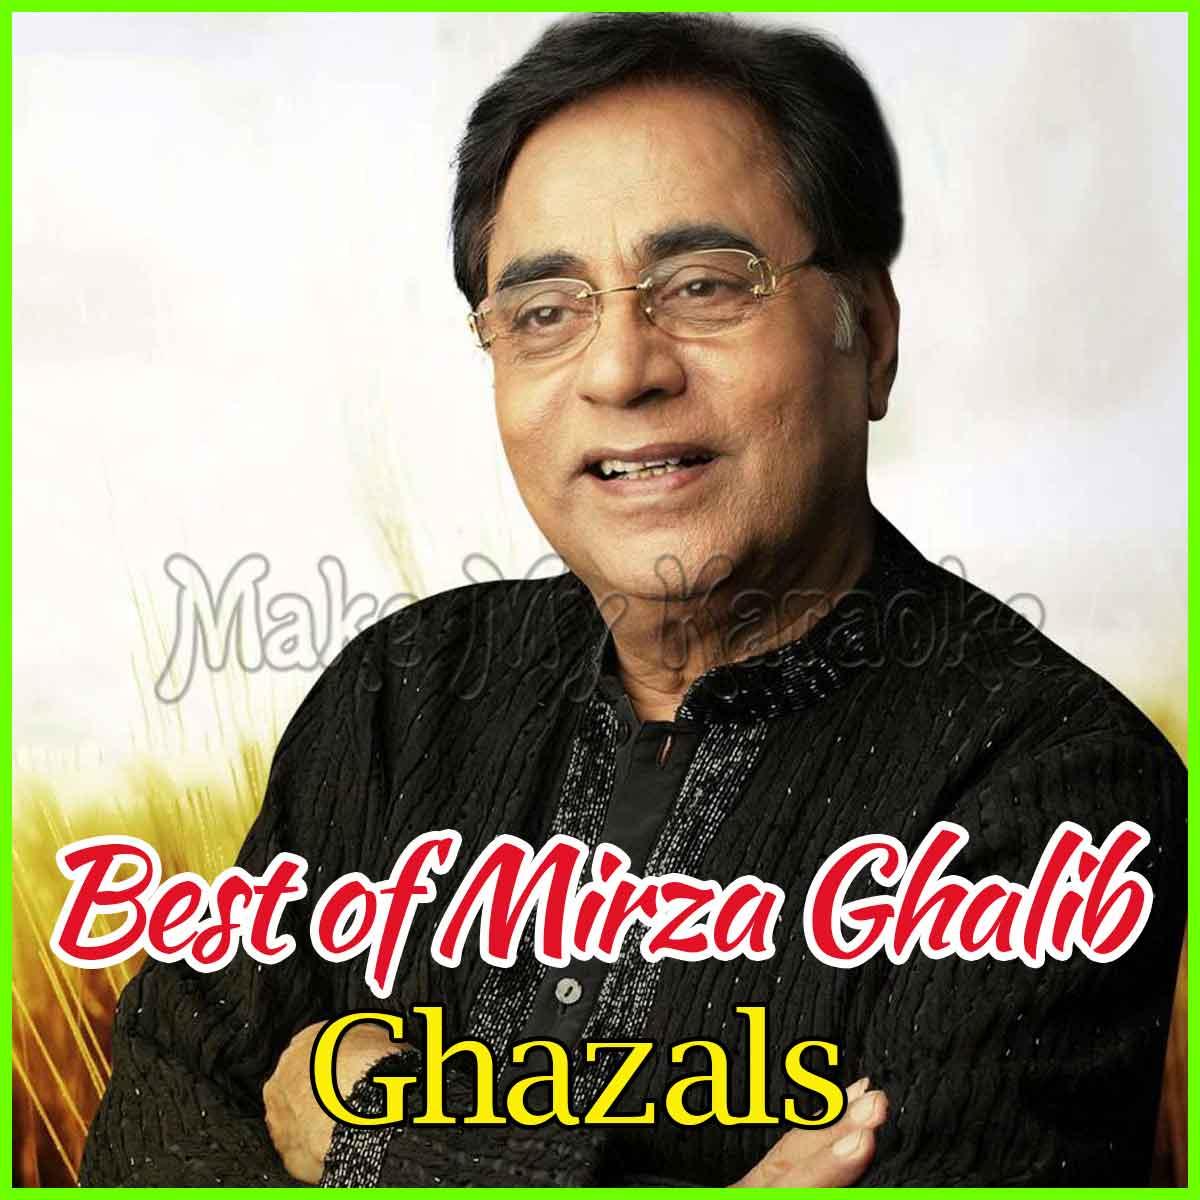 Meri Jawani Dede (Live Performance) - Best of Mirza Ghalib Ghazals (MP3  Format)